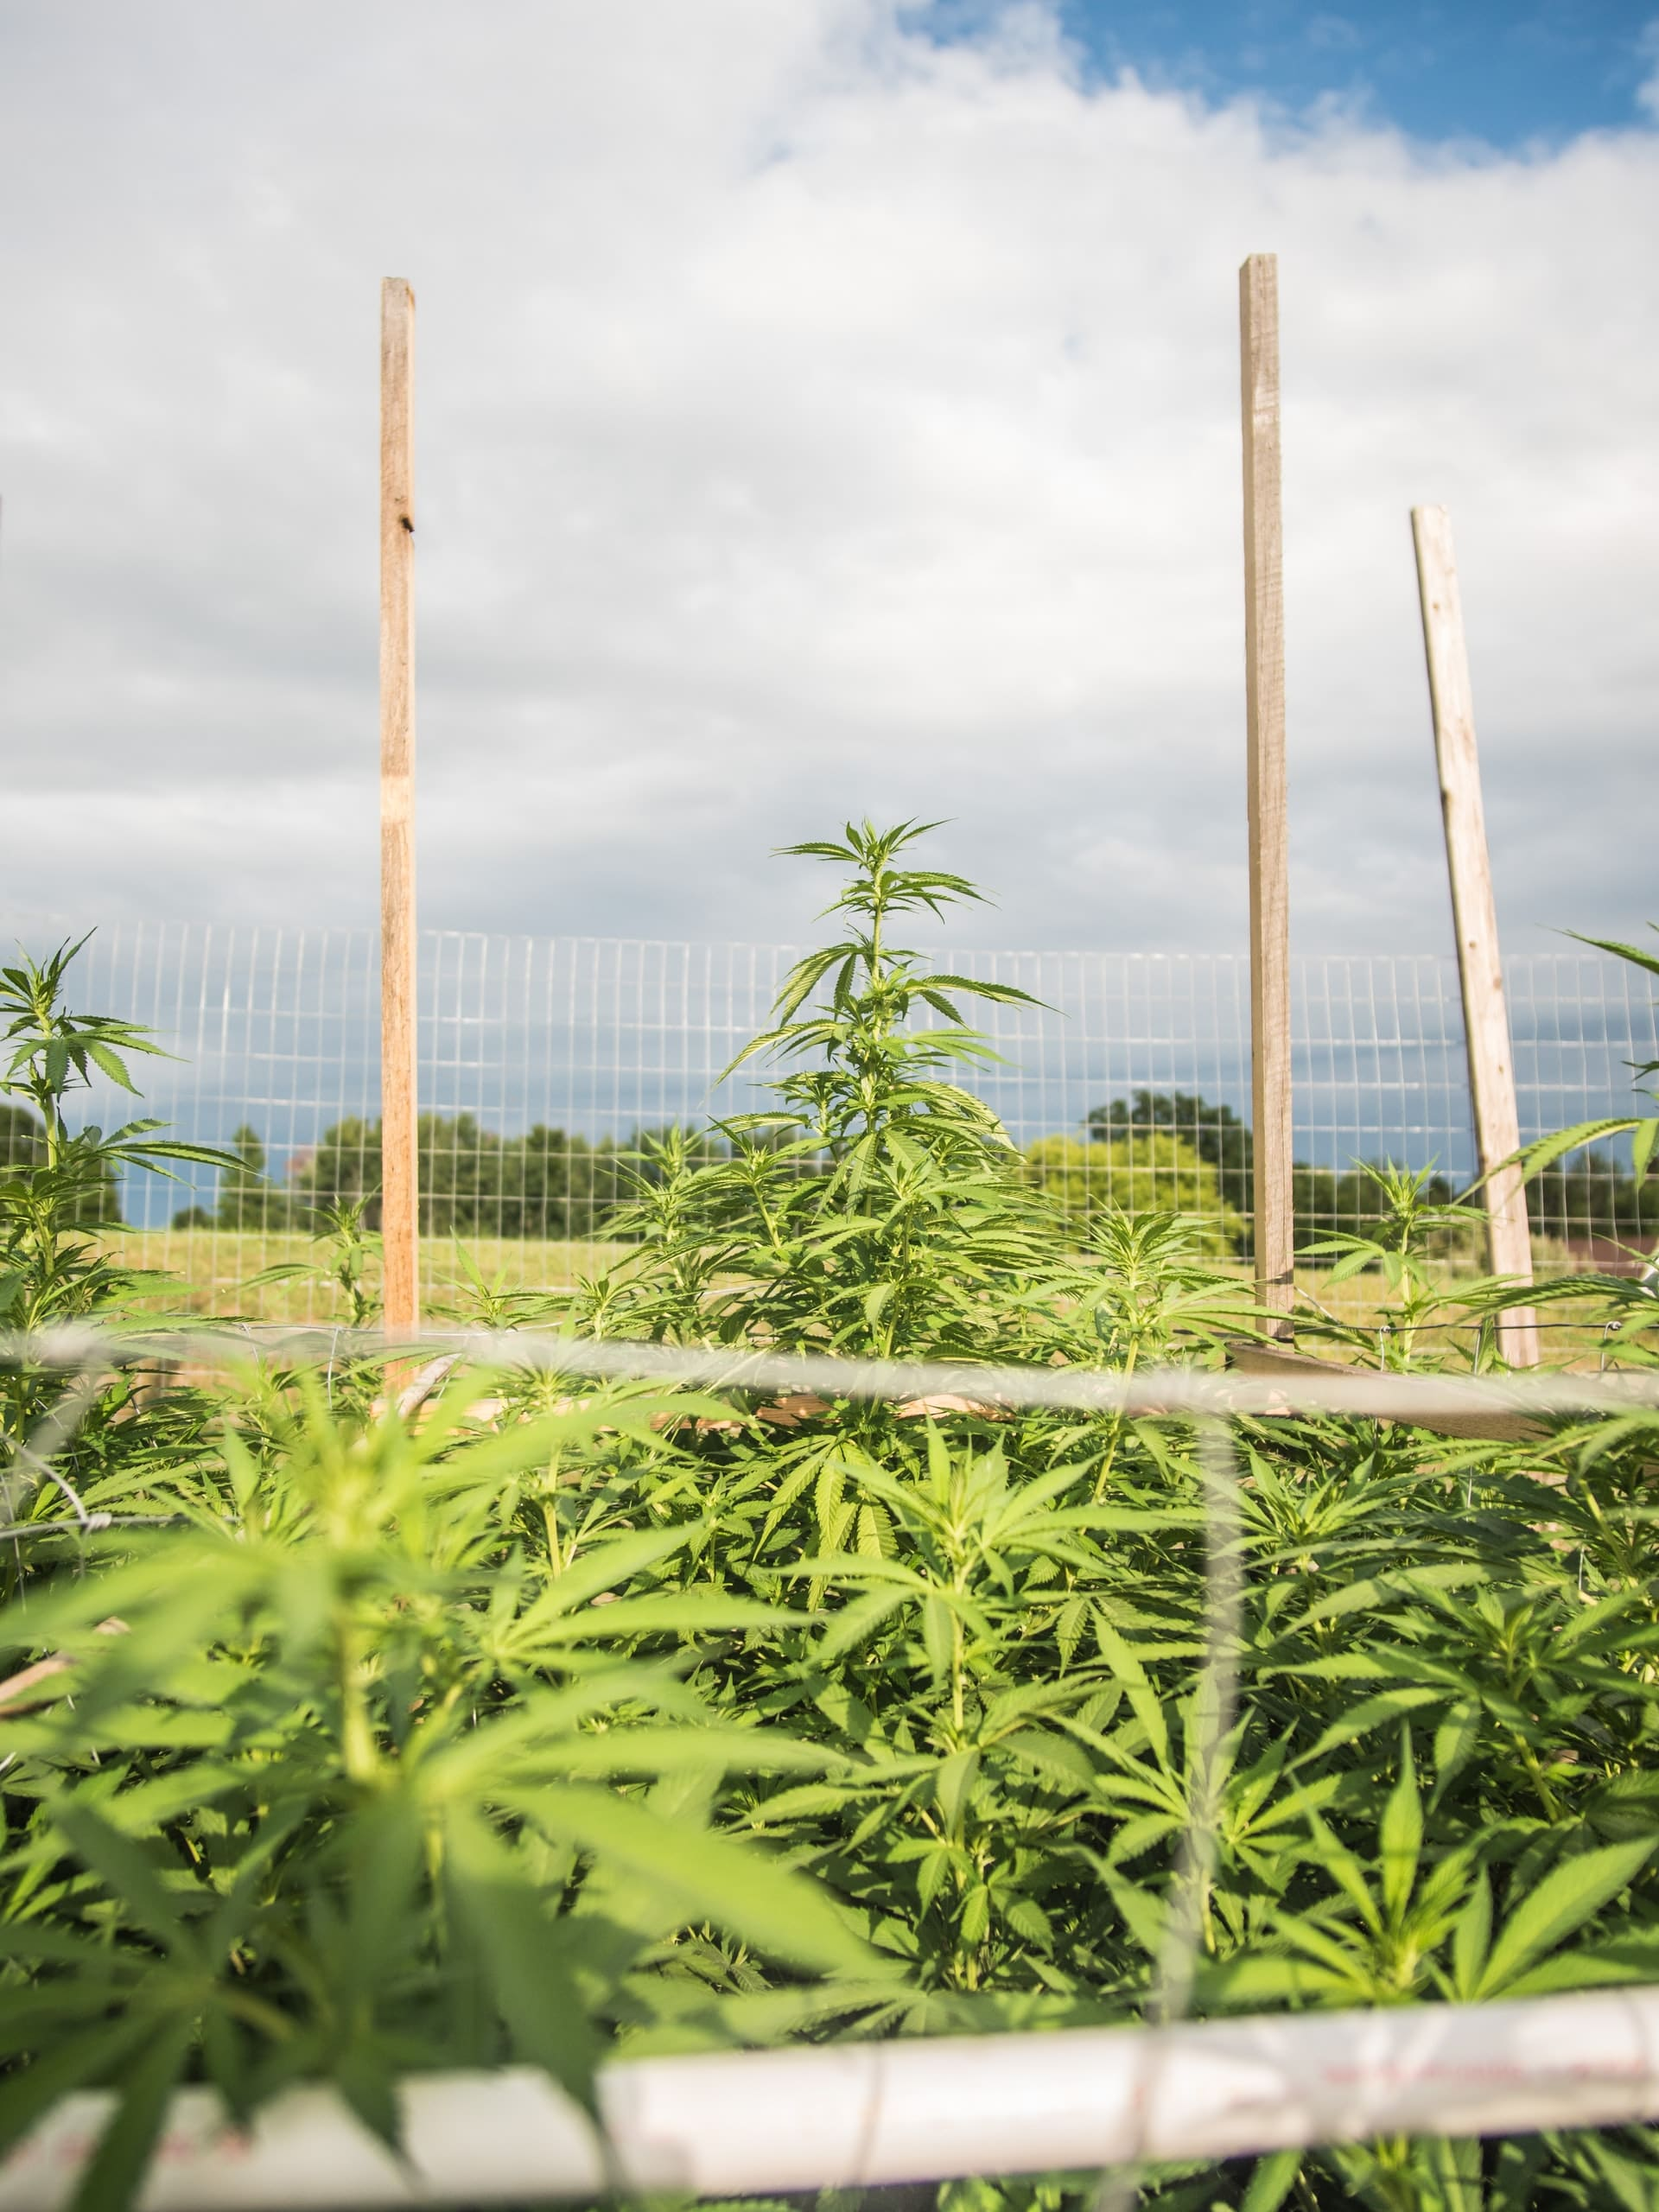 Colorado hemp and marijuana growers can't agree on new legislation to help farmers plan for weather